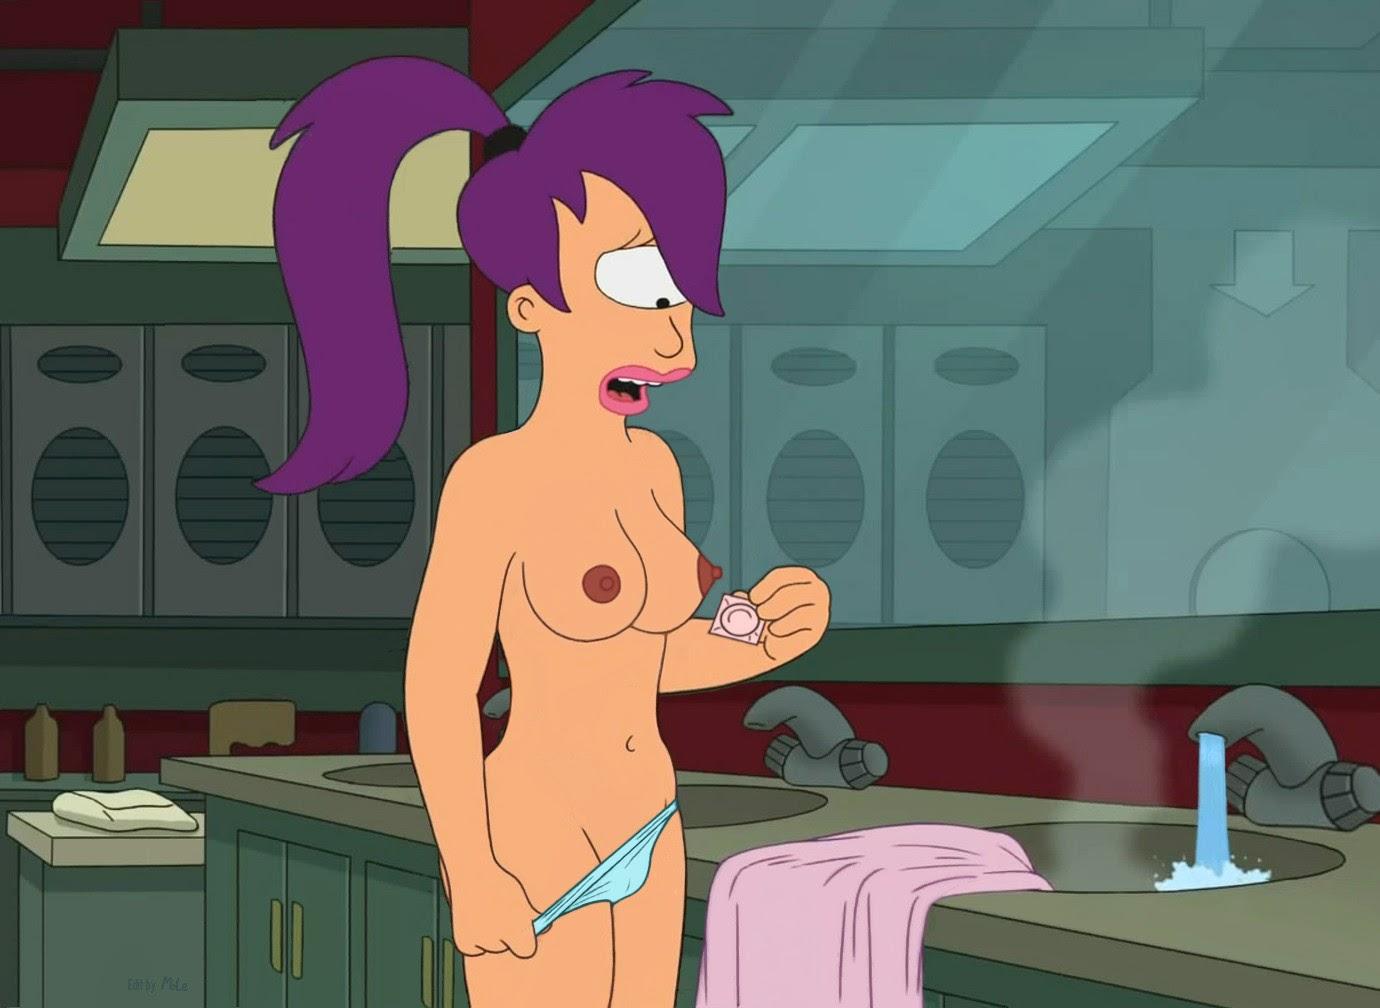 Порно мультик футурама смотреть